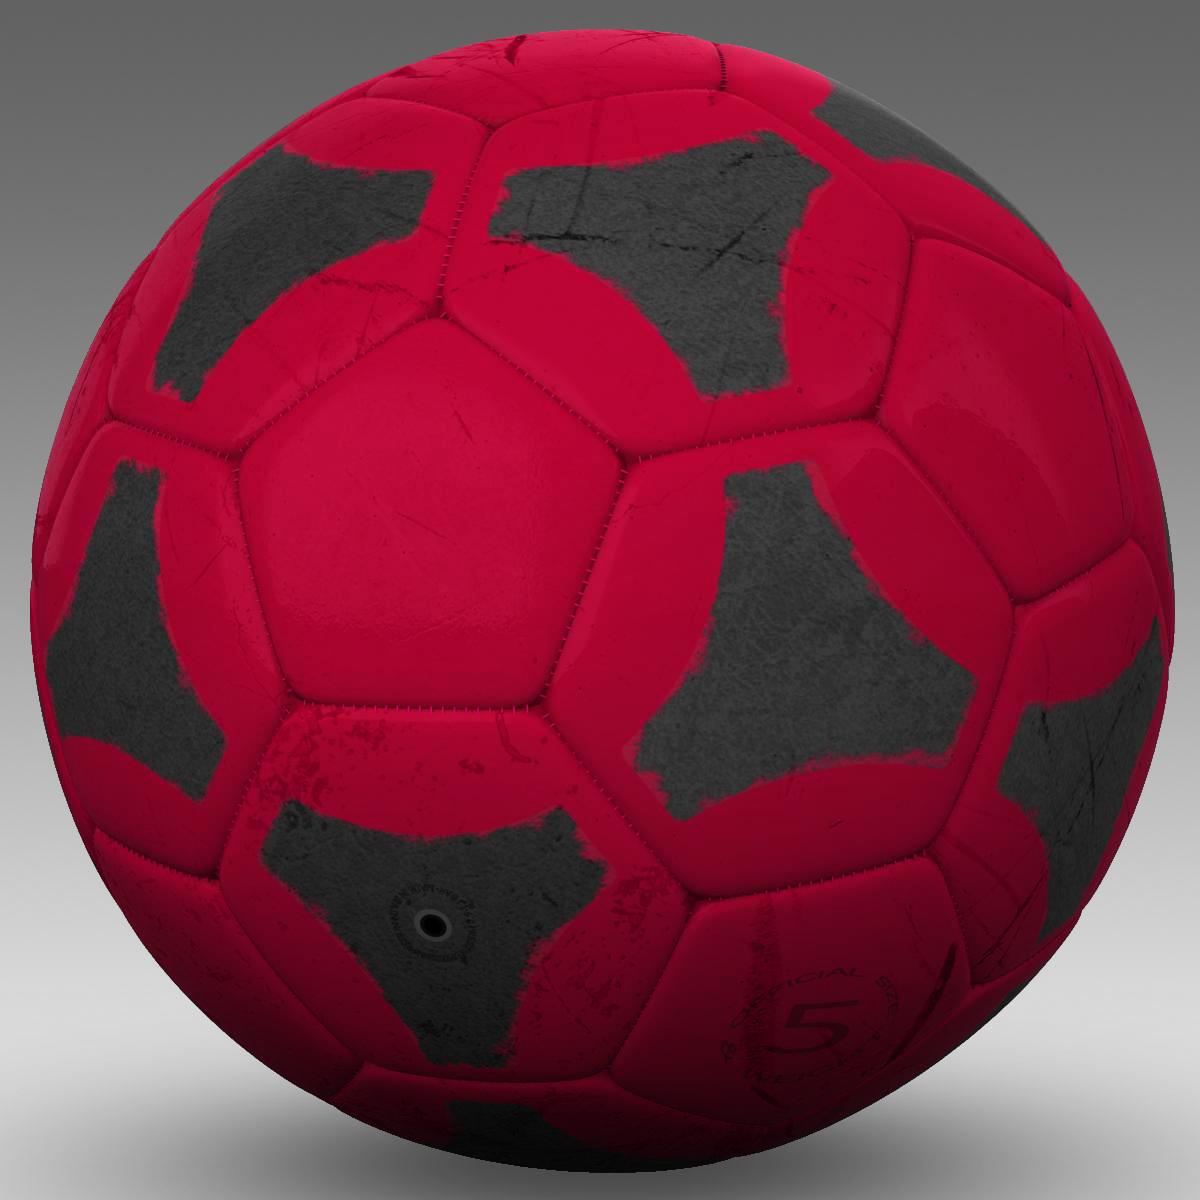 soccerball red black 3d model 3ds max fbx c4d ma mb obj 204554